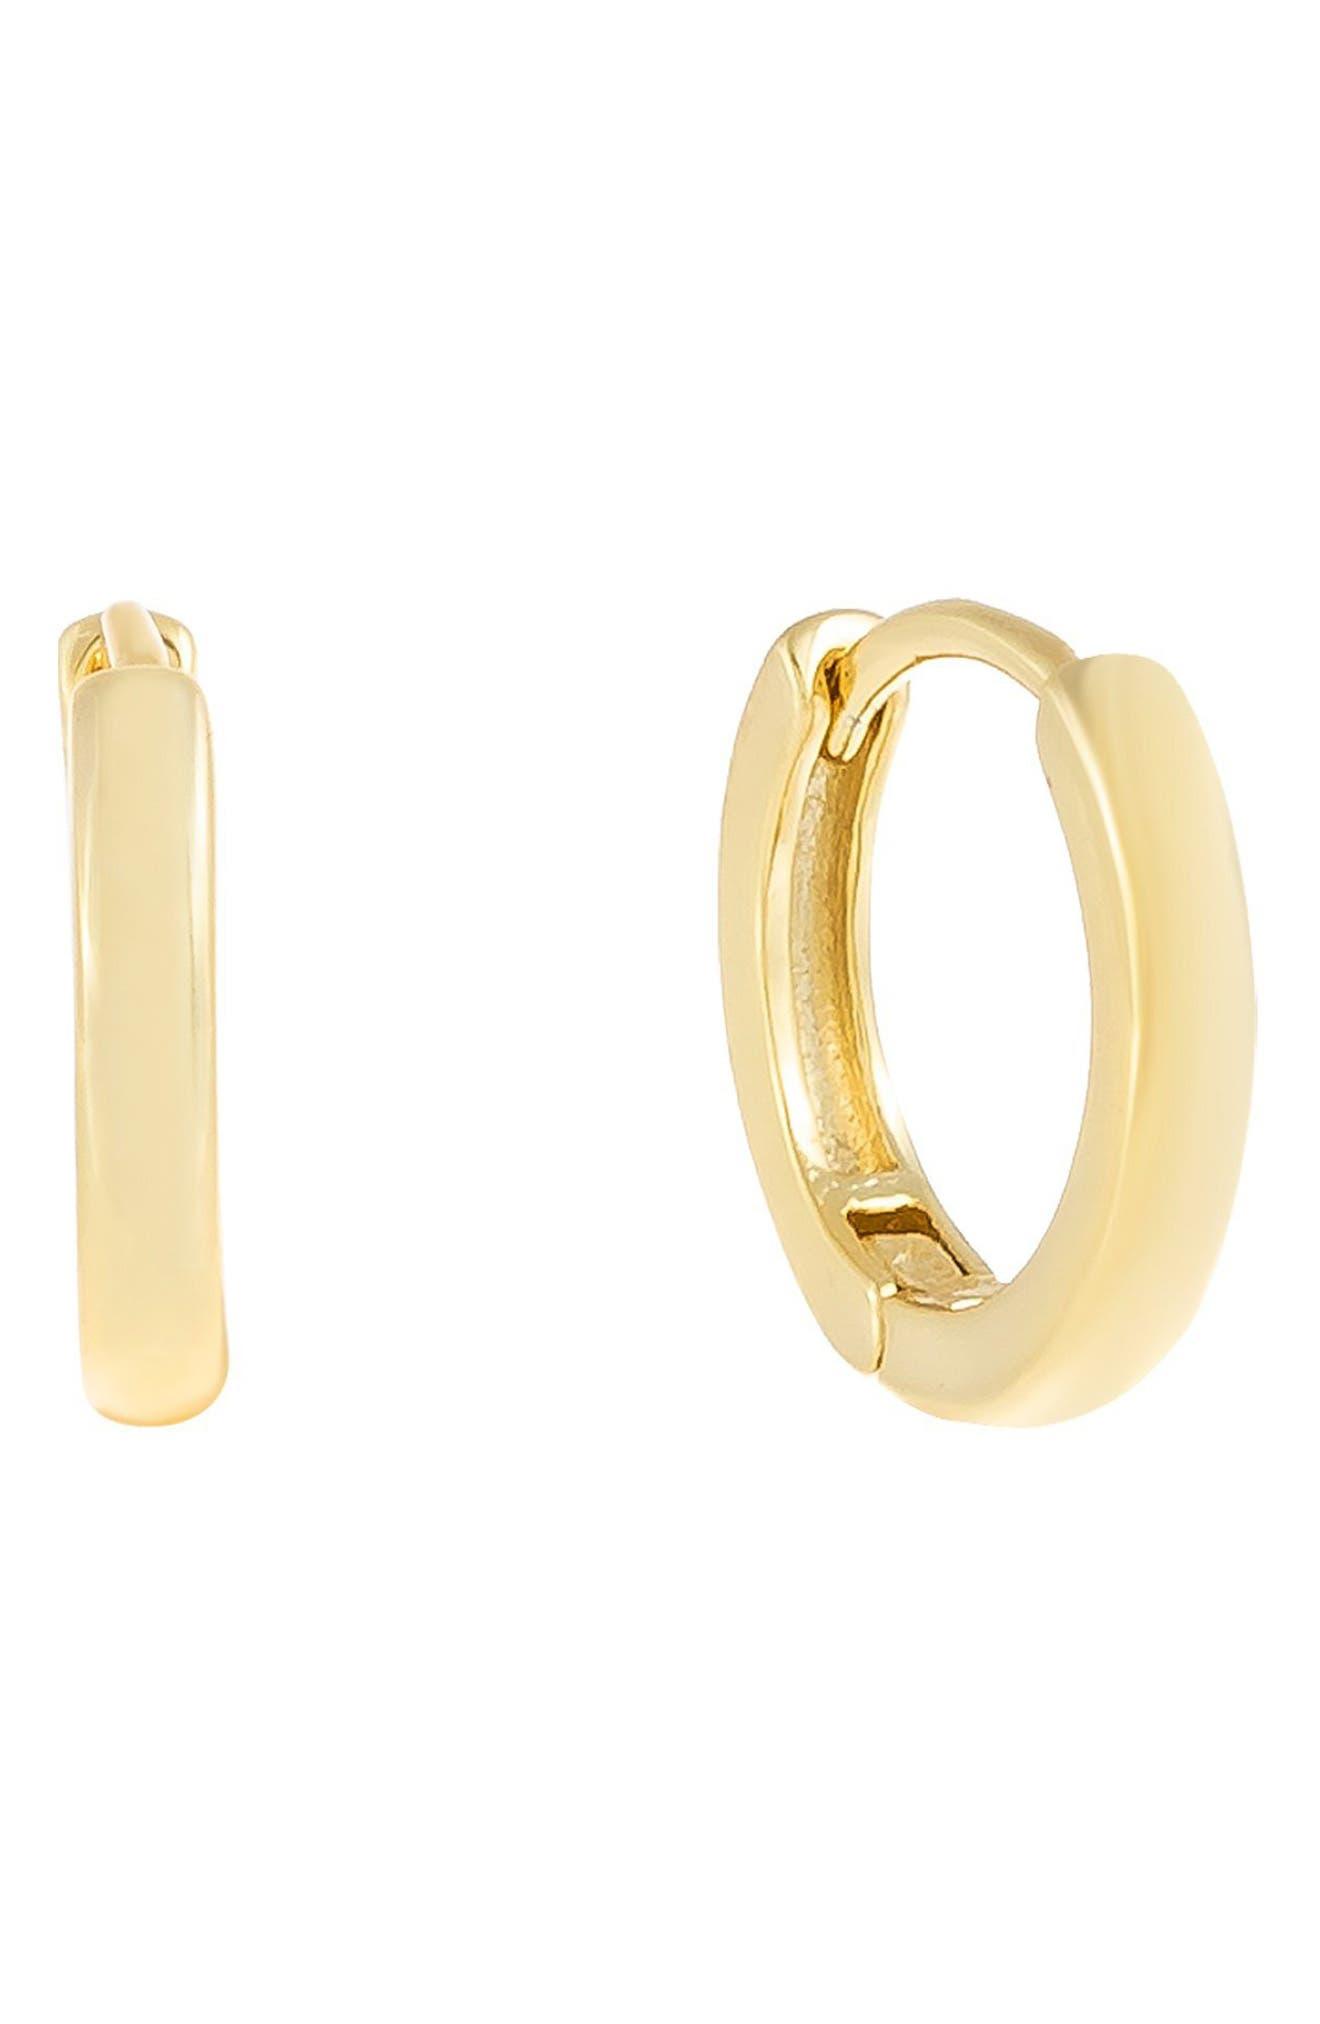 Women's Adina's Jewels Huggie Hoop Earrings